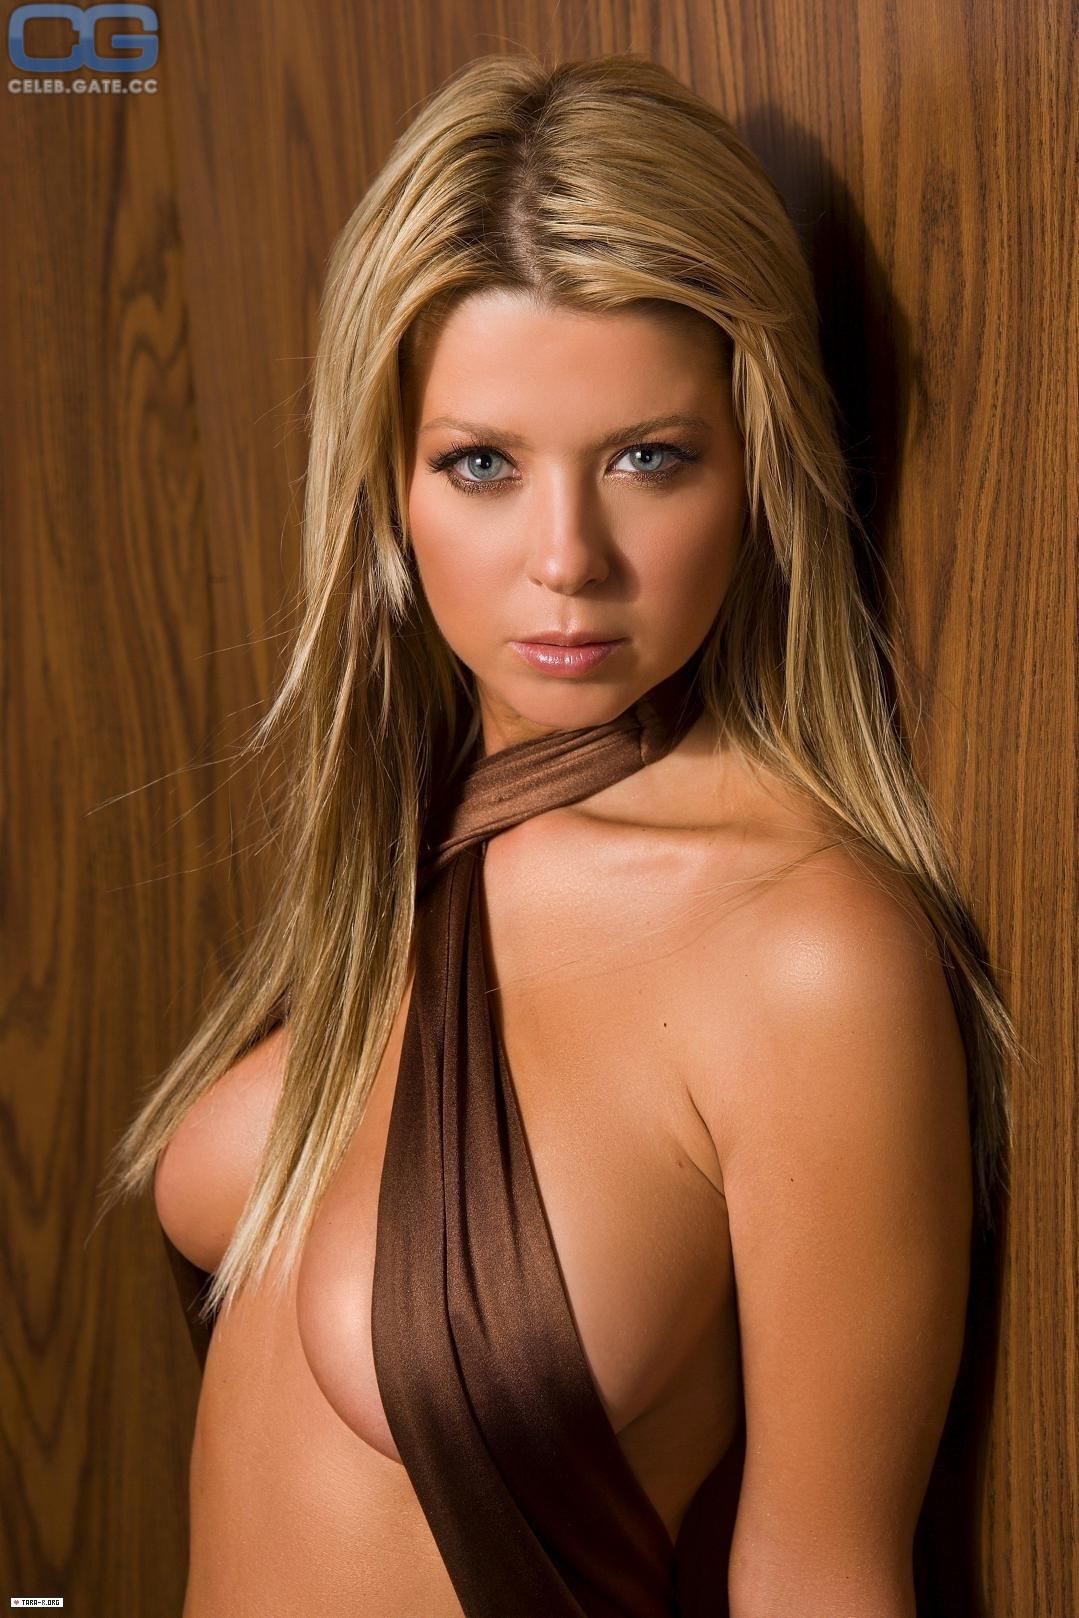 Bikini Tara Reid Nude Playboy Png